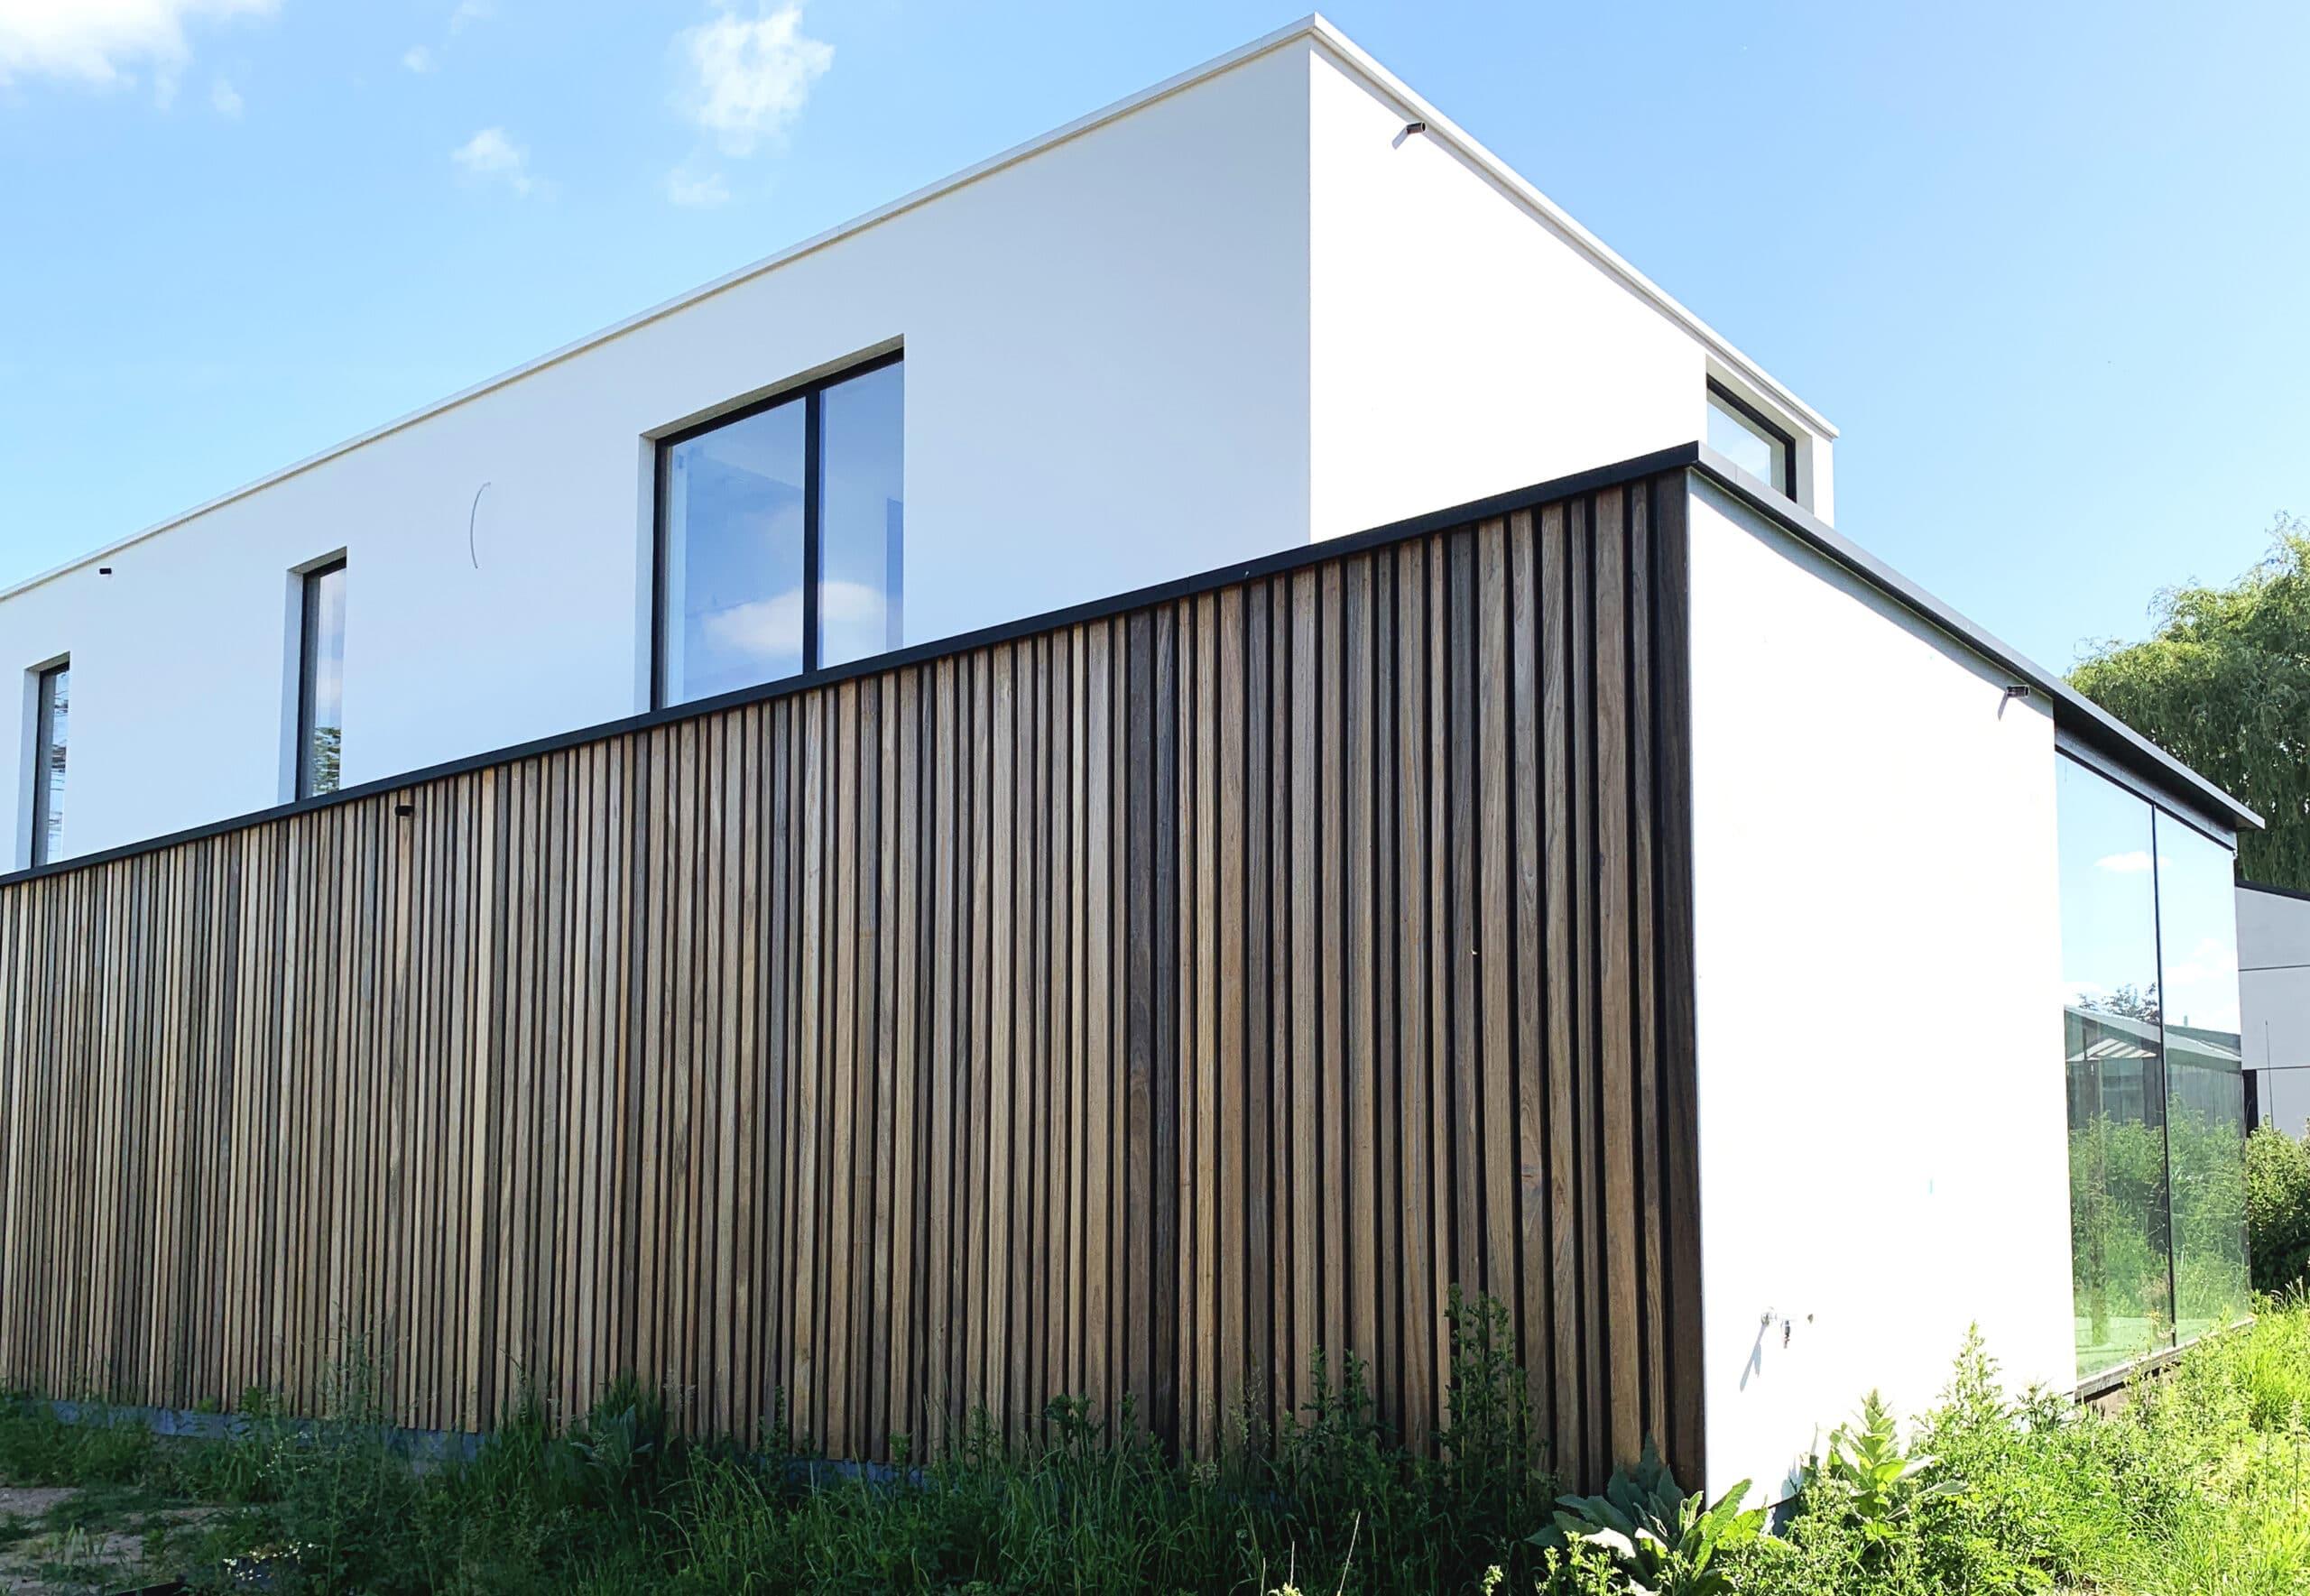 Unknown 1 1 scaled | Baeyens & Beck architecten Gent | architect nieuwbouw renovatie interieur | high end | architectenbureau